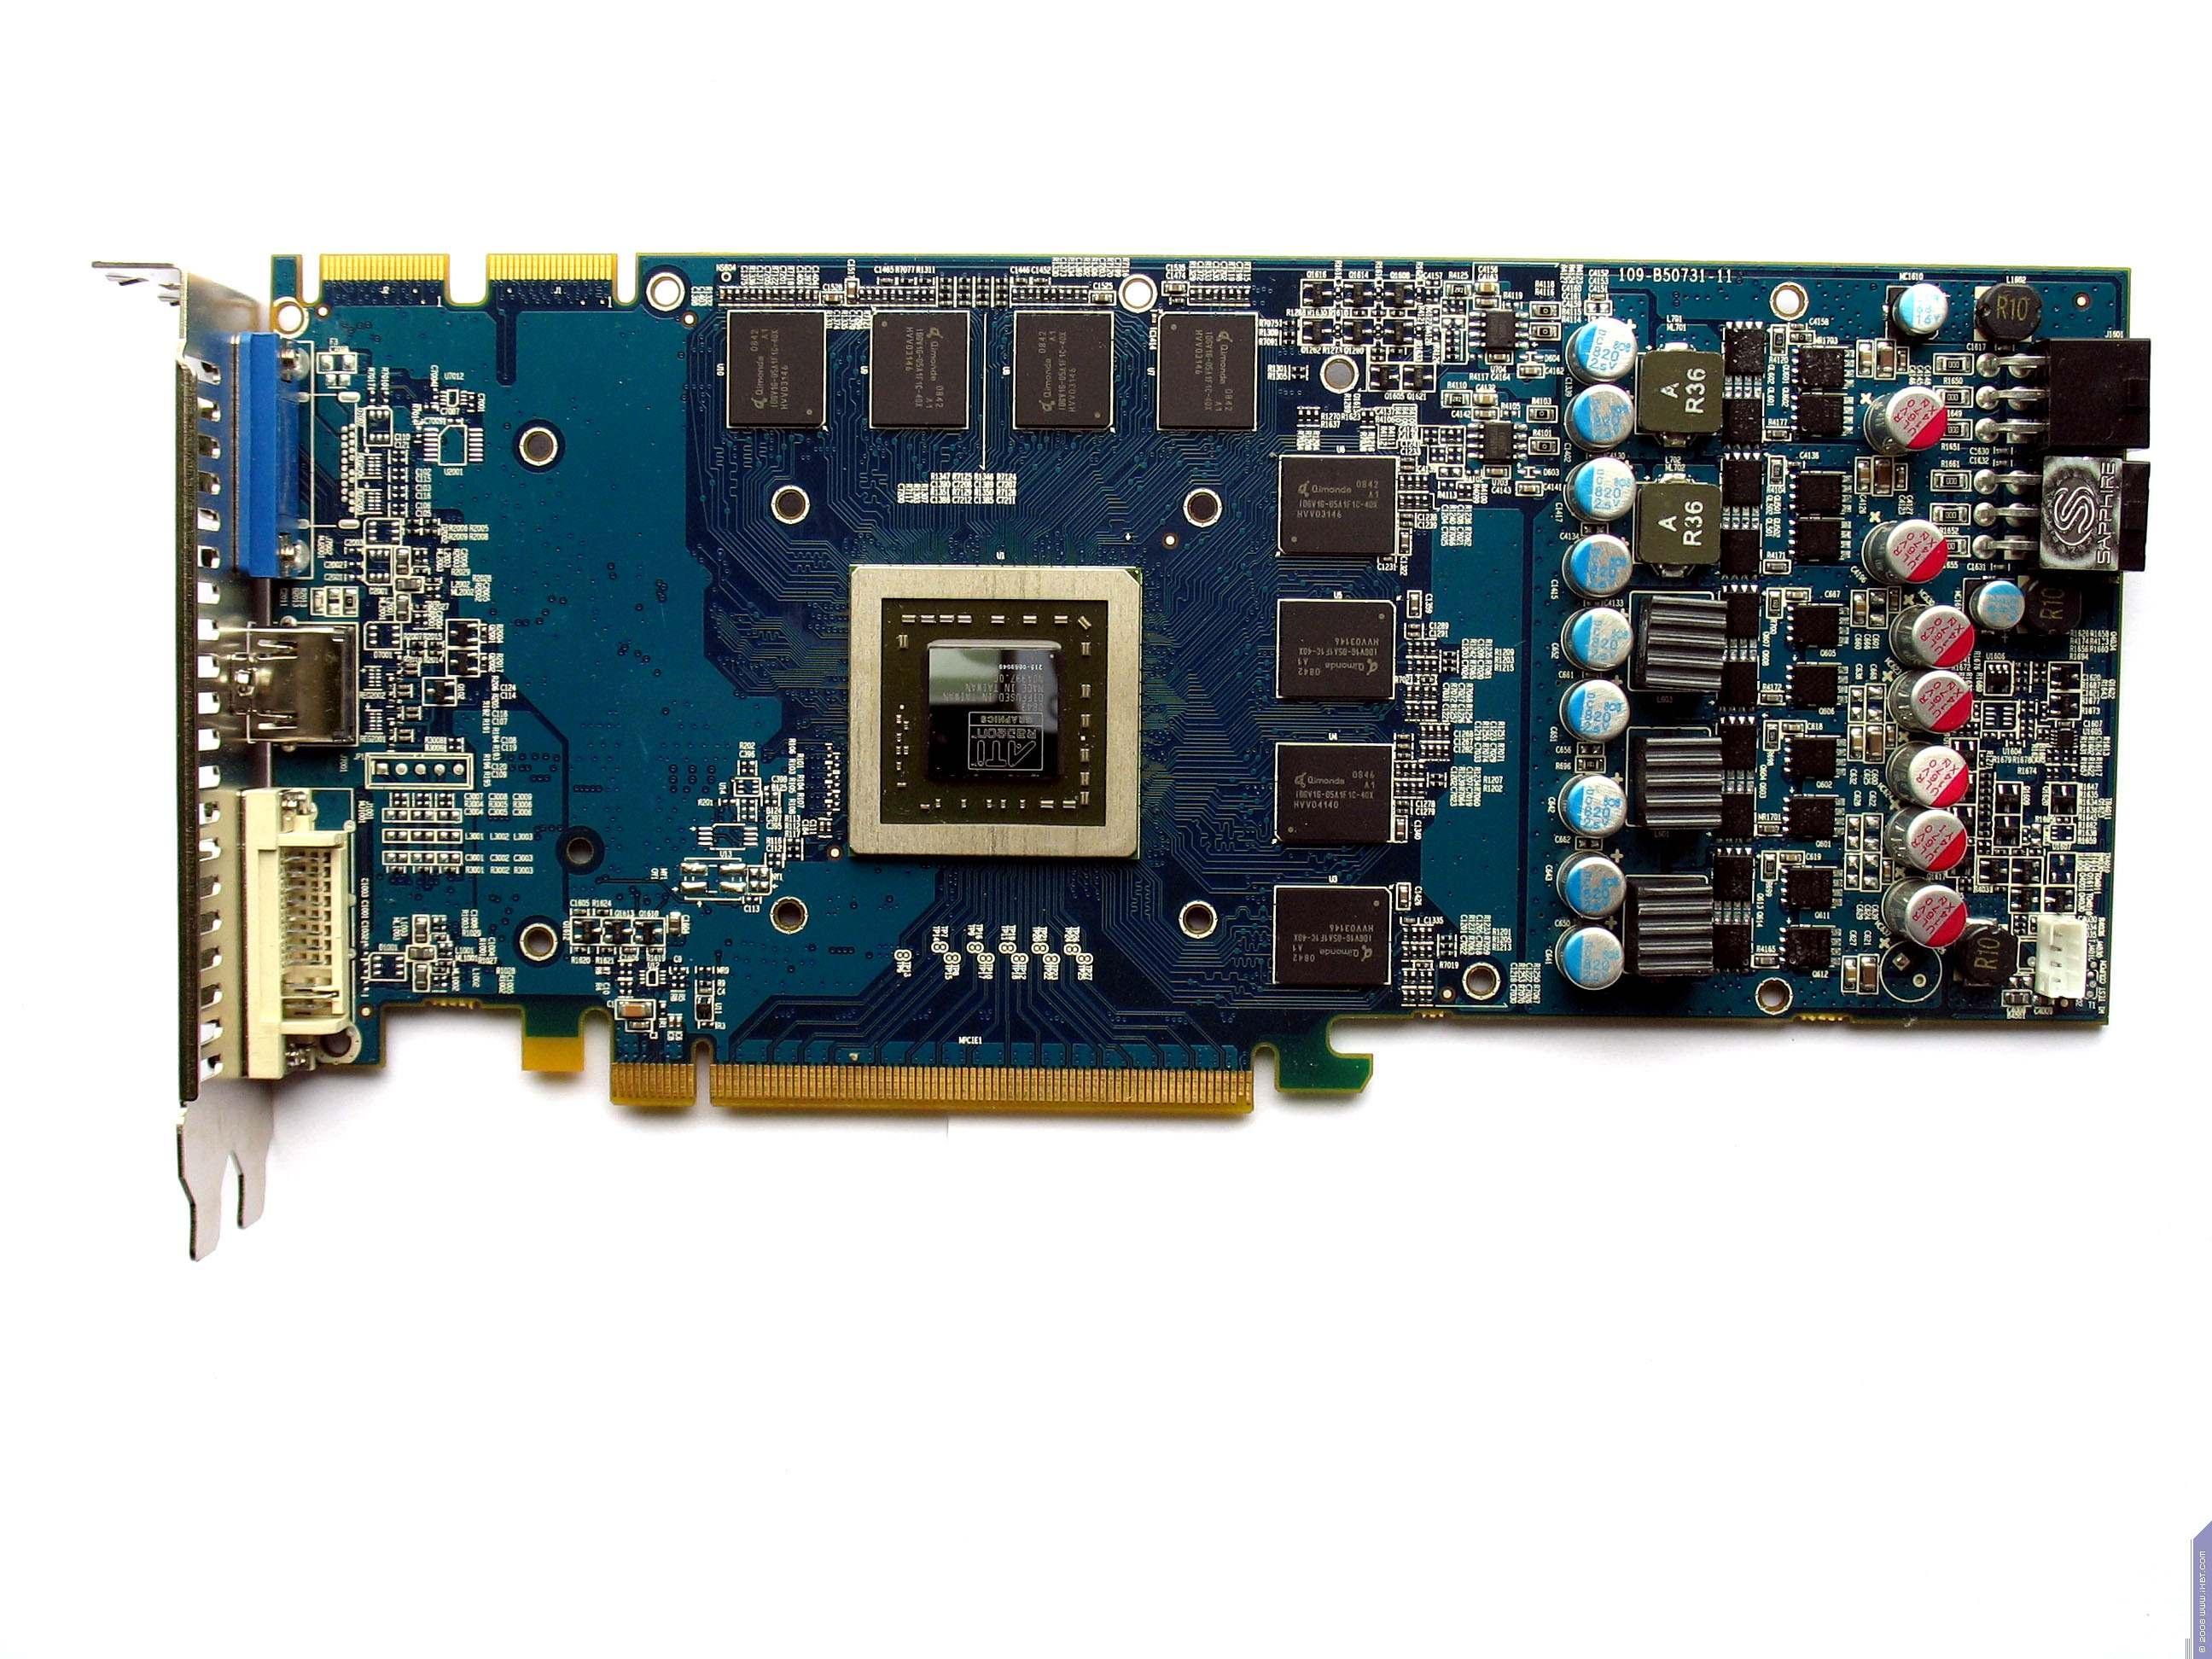 Sapphire Radeon Hd 4870 Драйвера